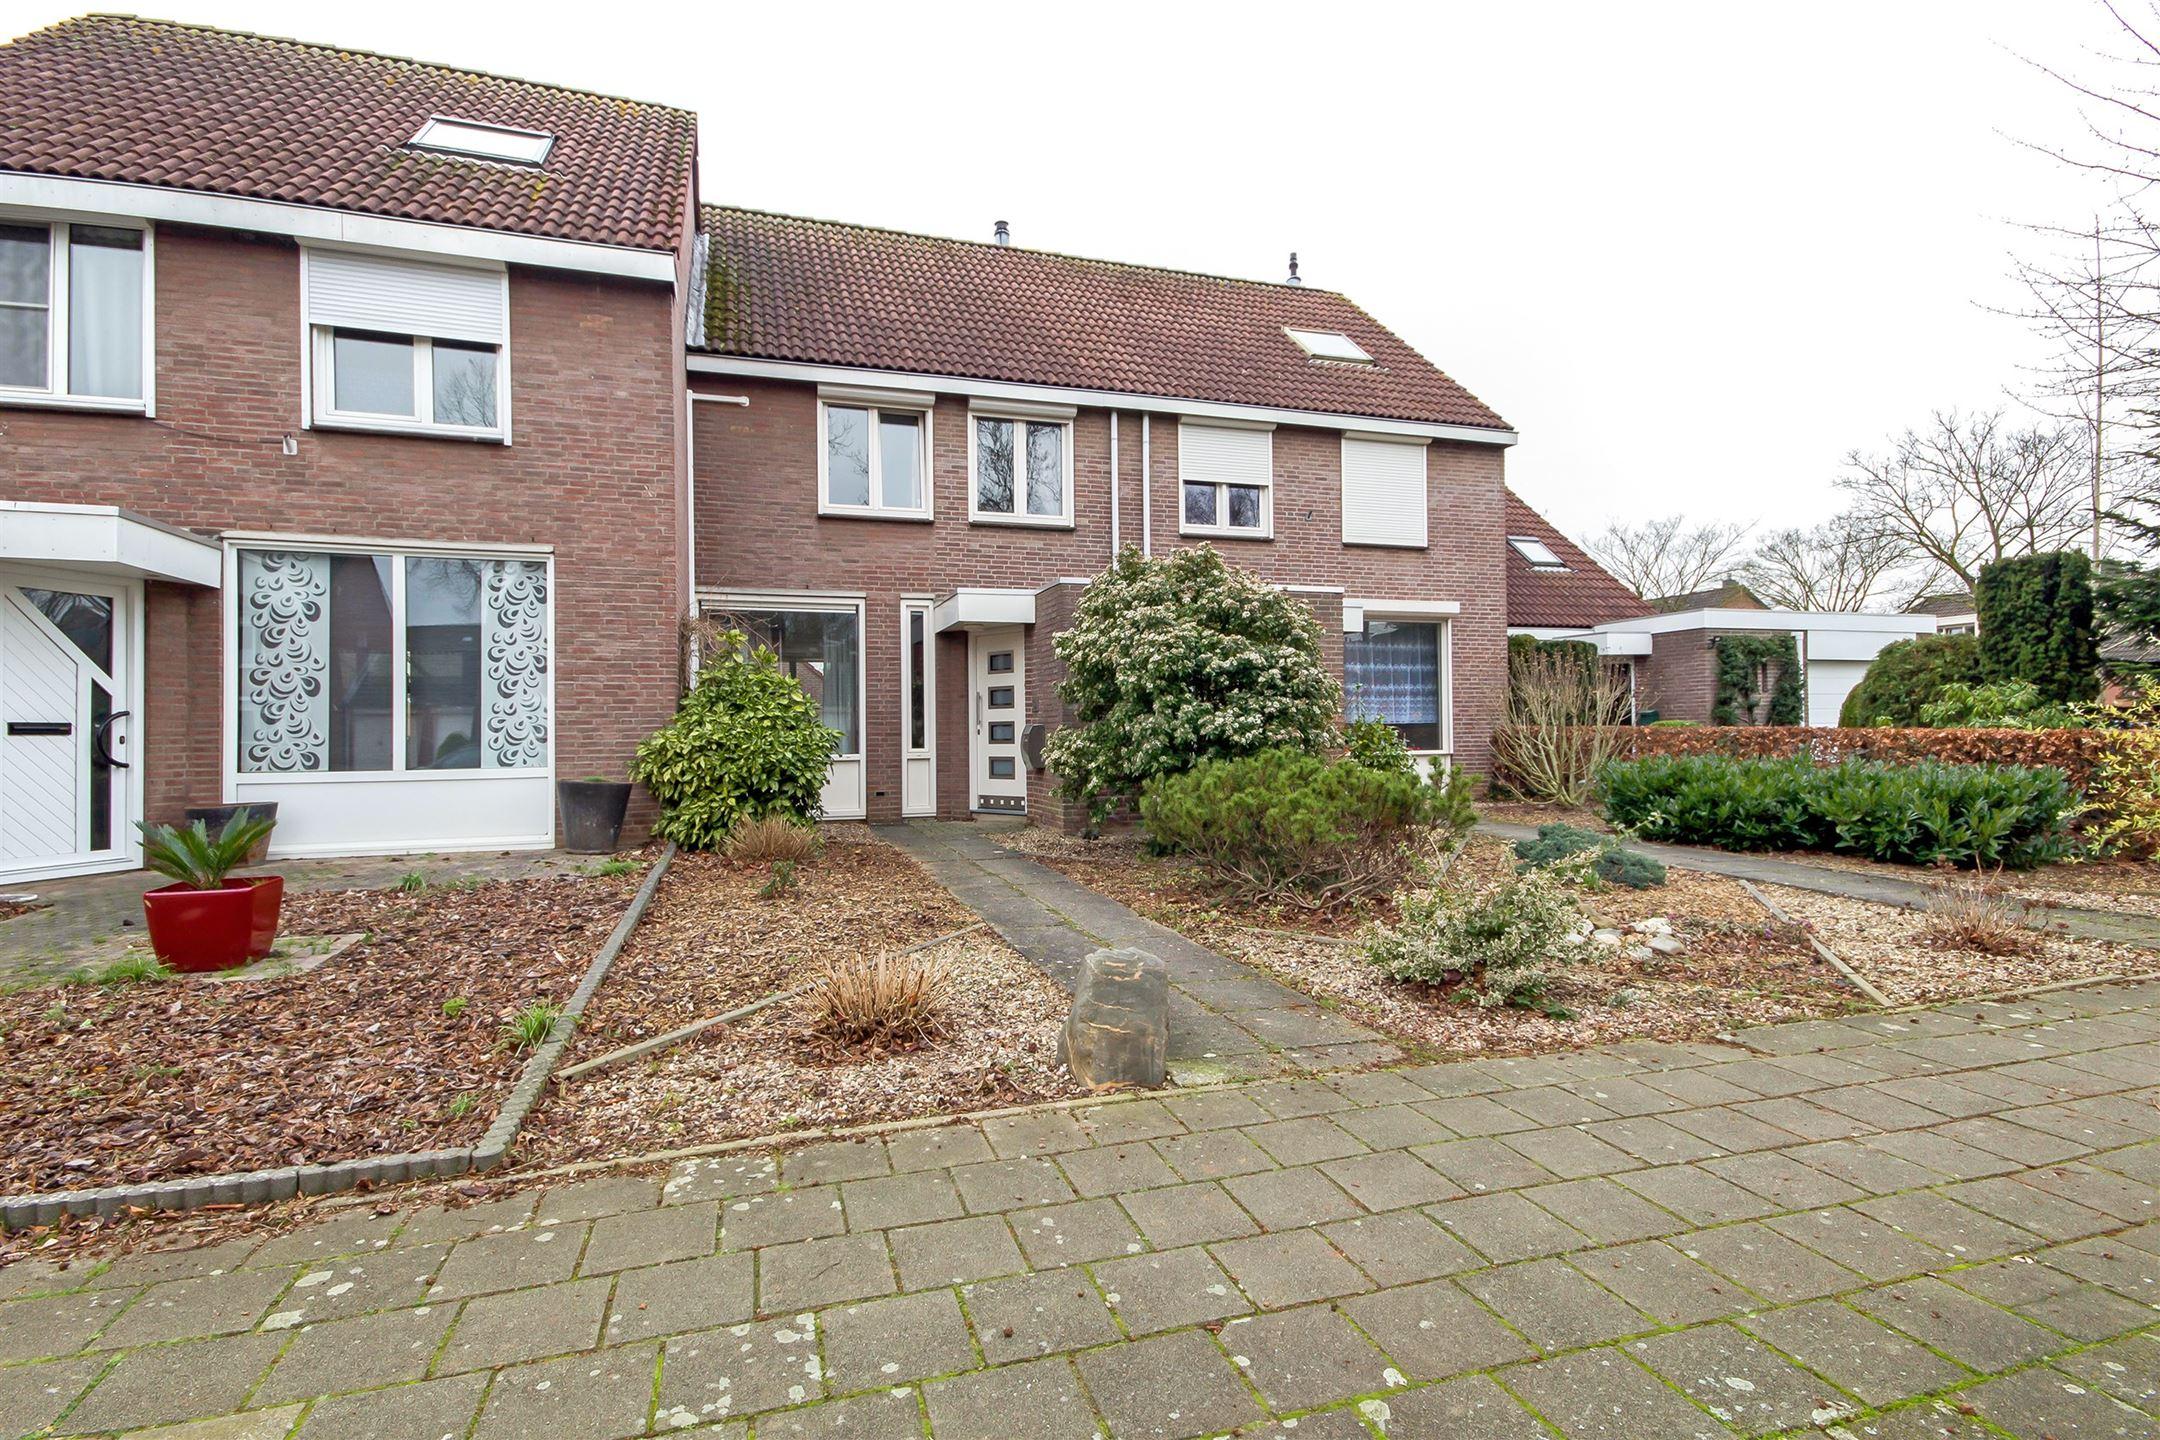 Verkocht faunasingel 56 6043 wr roermond funda for Huis tuin roermond